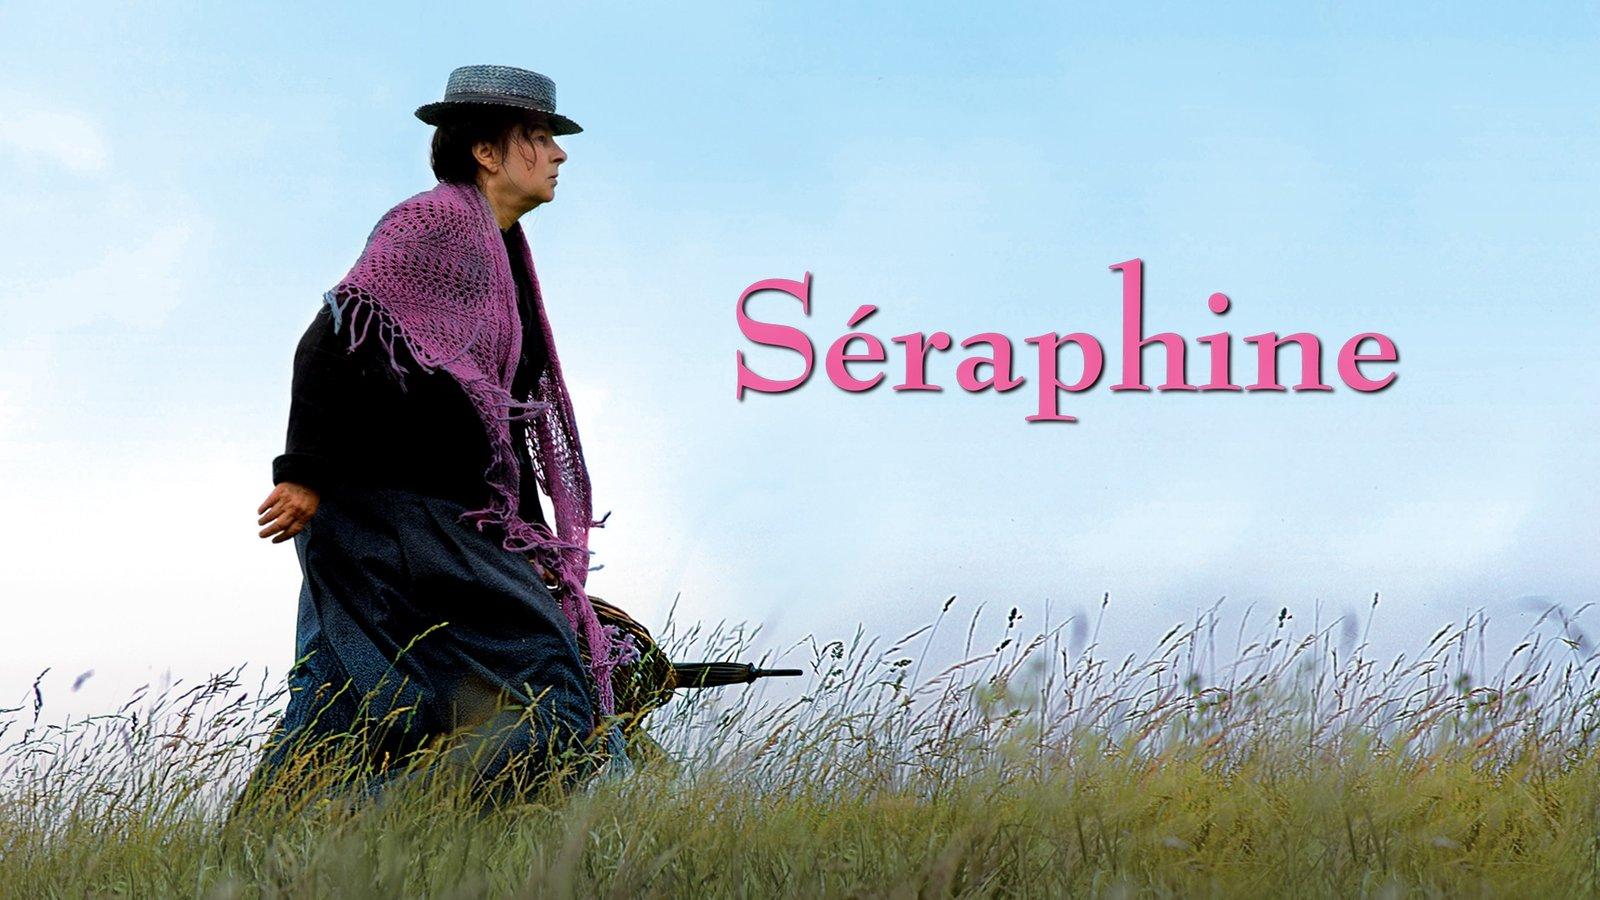 Seraphine